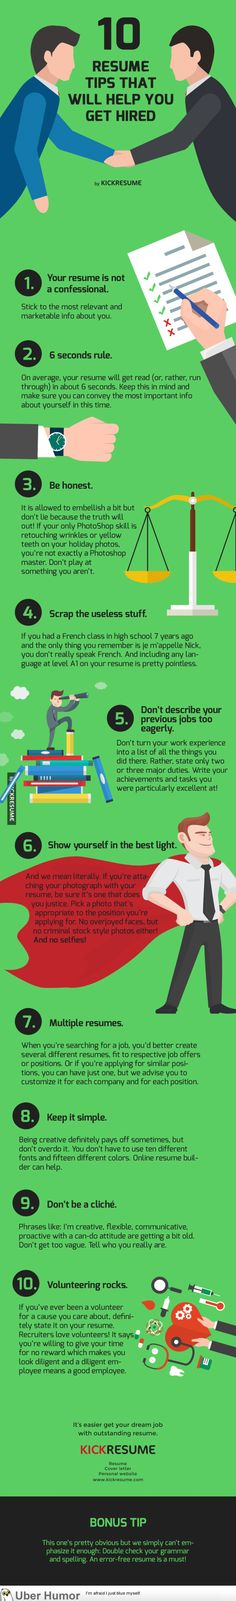 Glassdoor u2013 Get Hired Love Your Job Job Search Pinterest - get hired resume tips